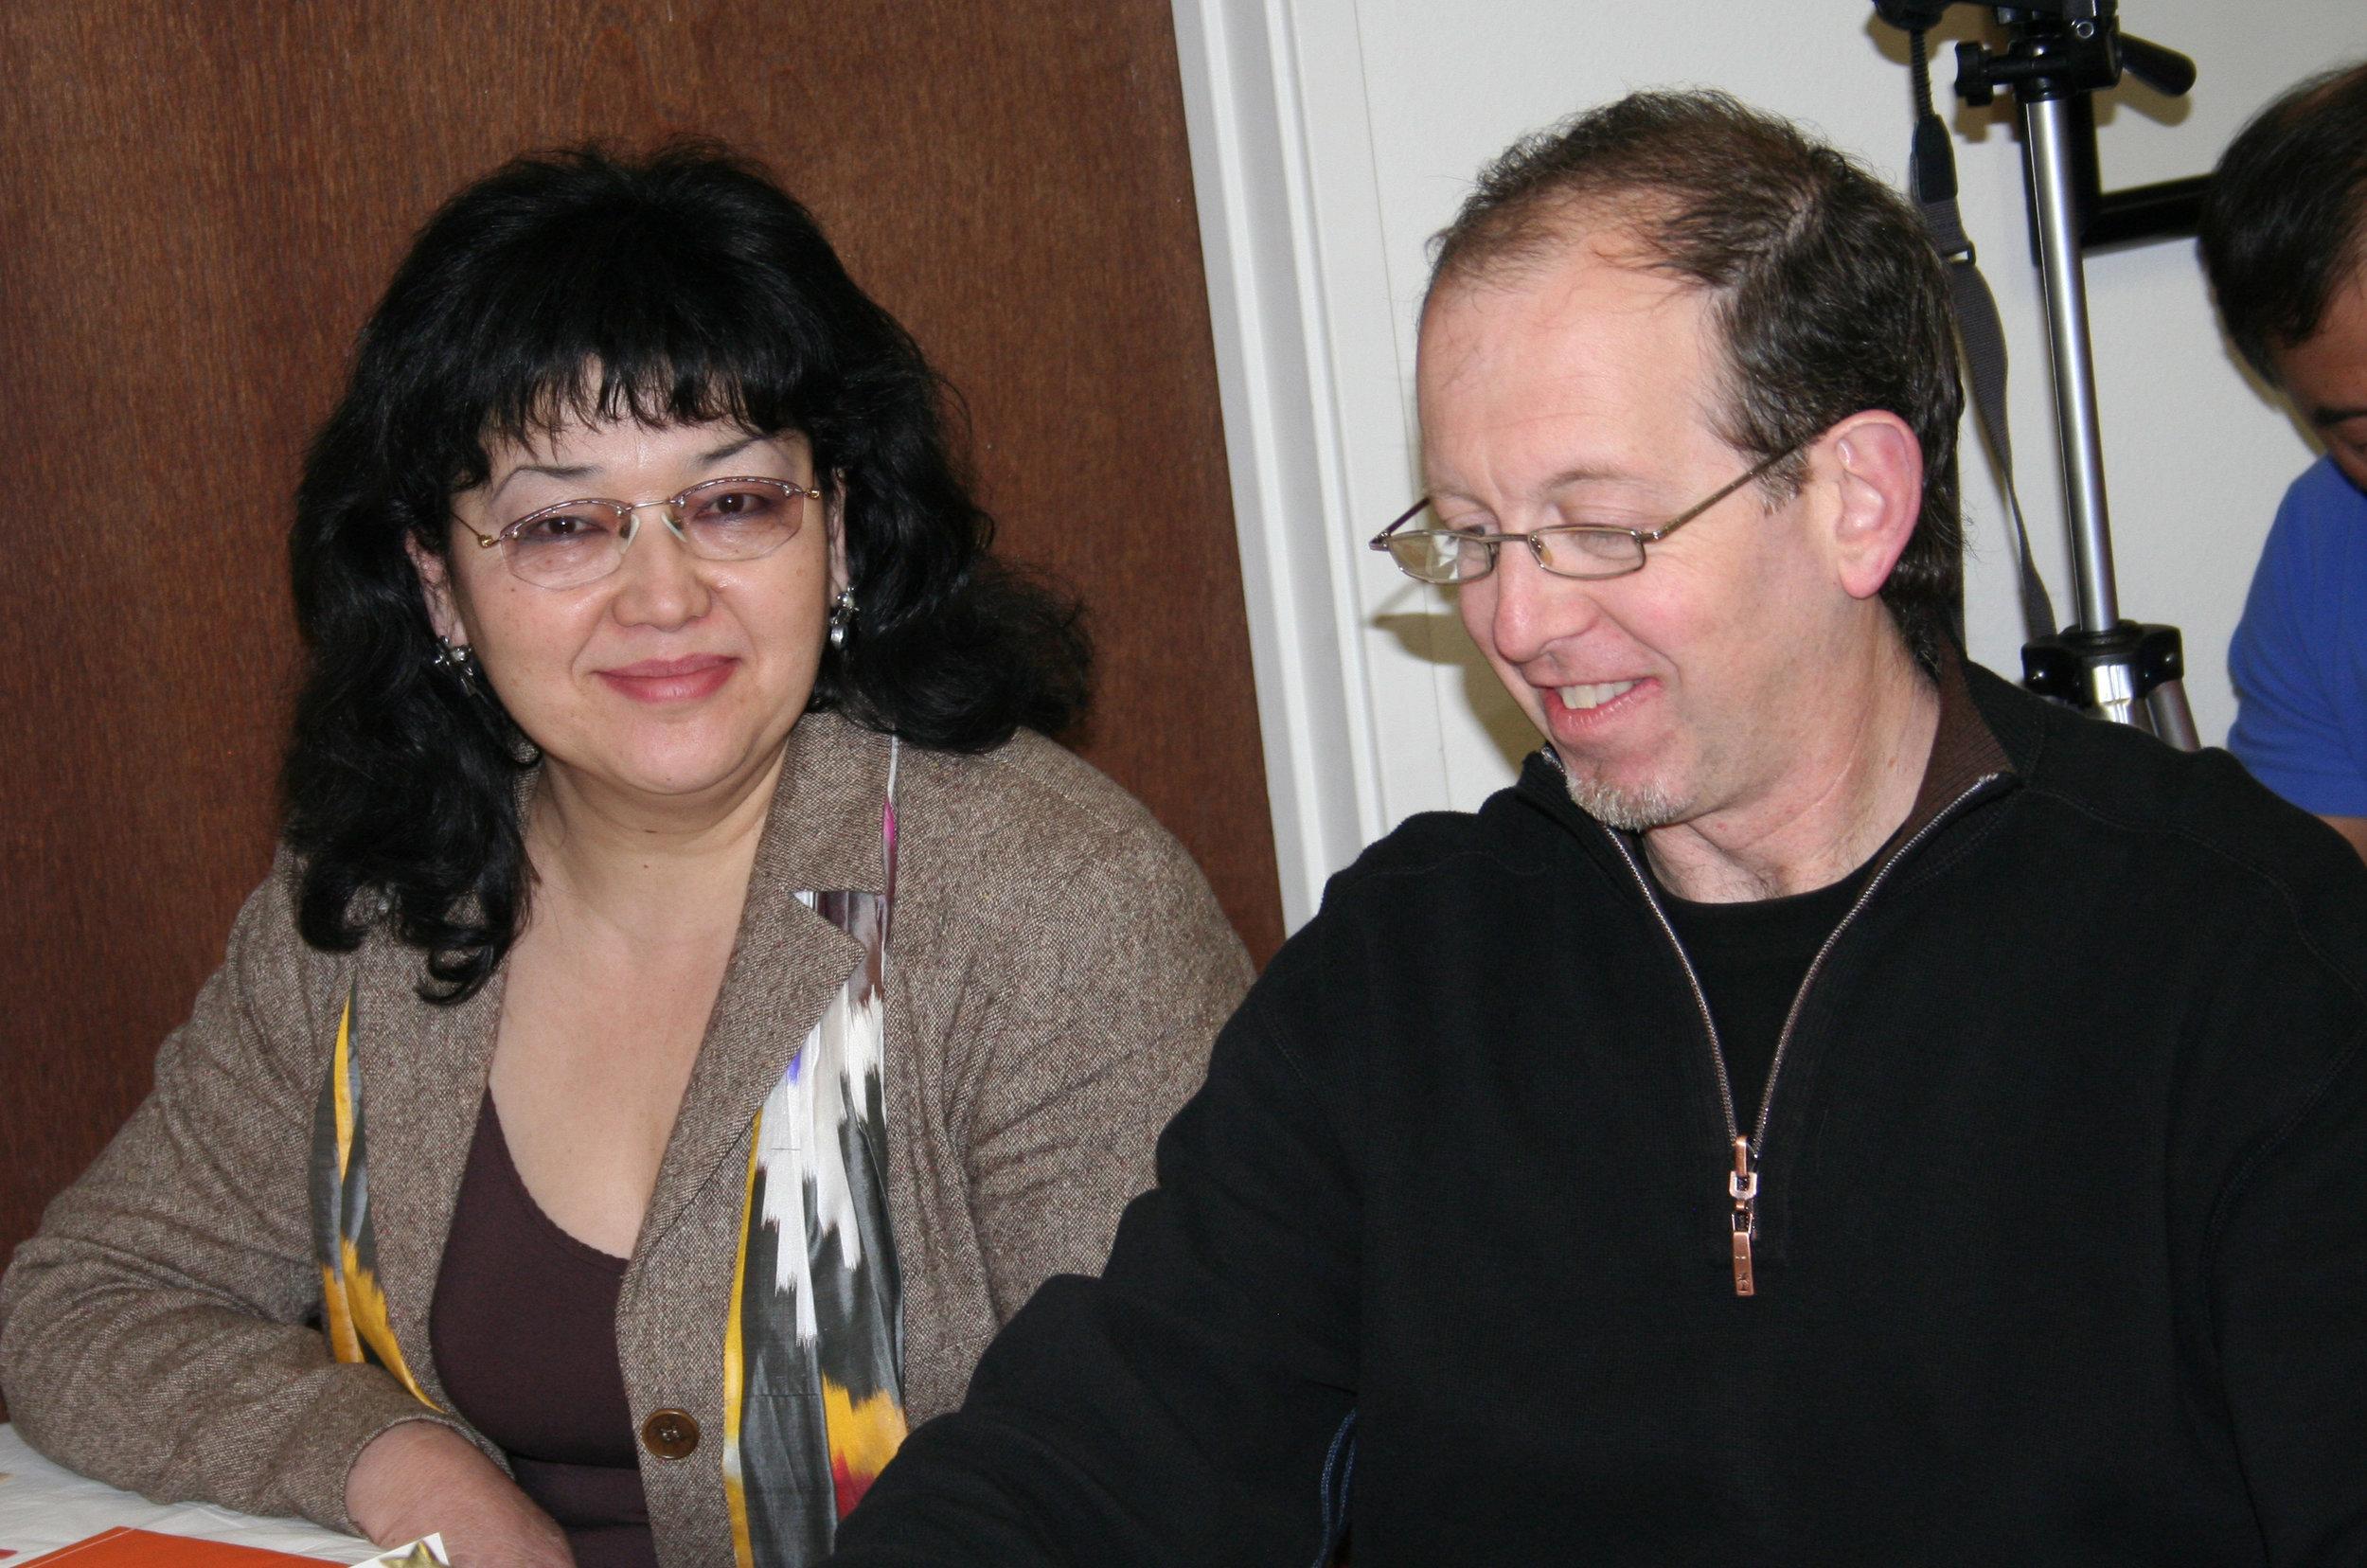 Dr. Mavlyuda Yakubkhodjaeva,  Assistant Professor Emeritus, Kazan Conservatory, Kazan, Russia, with  Professor Richard Cionco , were adjudicating at the AAM Festival.